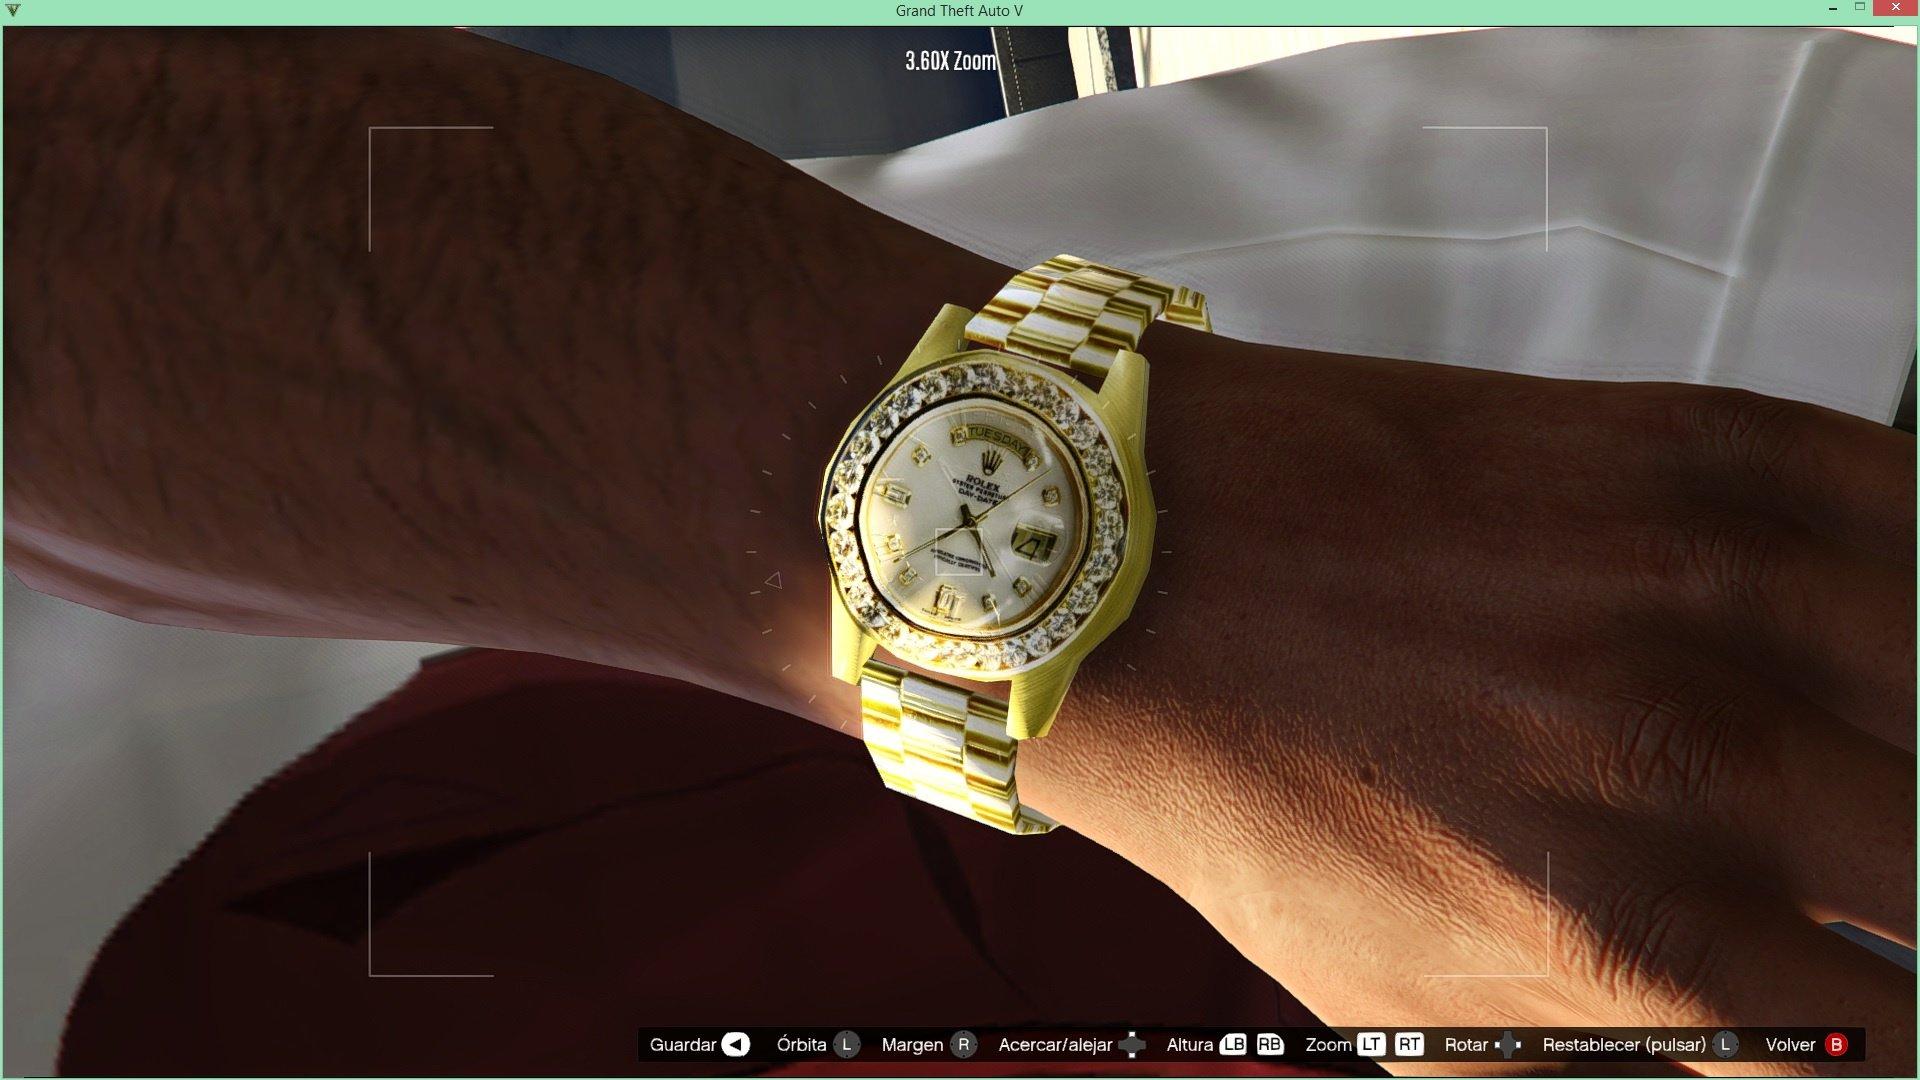 d6f60b20c5f Iced Out Rolex + Gucci Band - GTA5-Mods.com